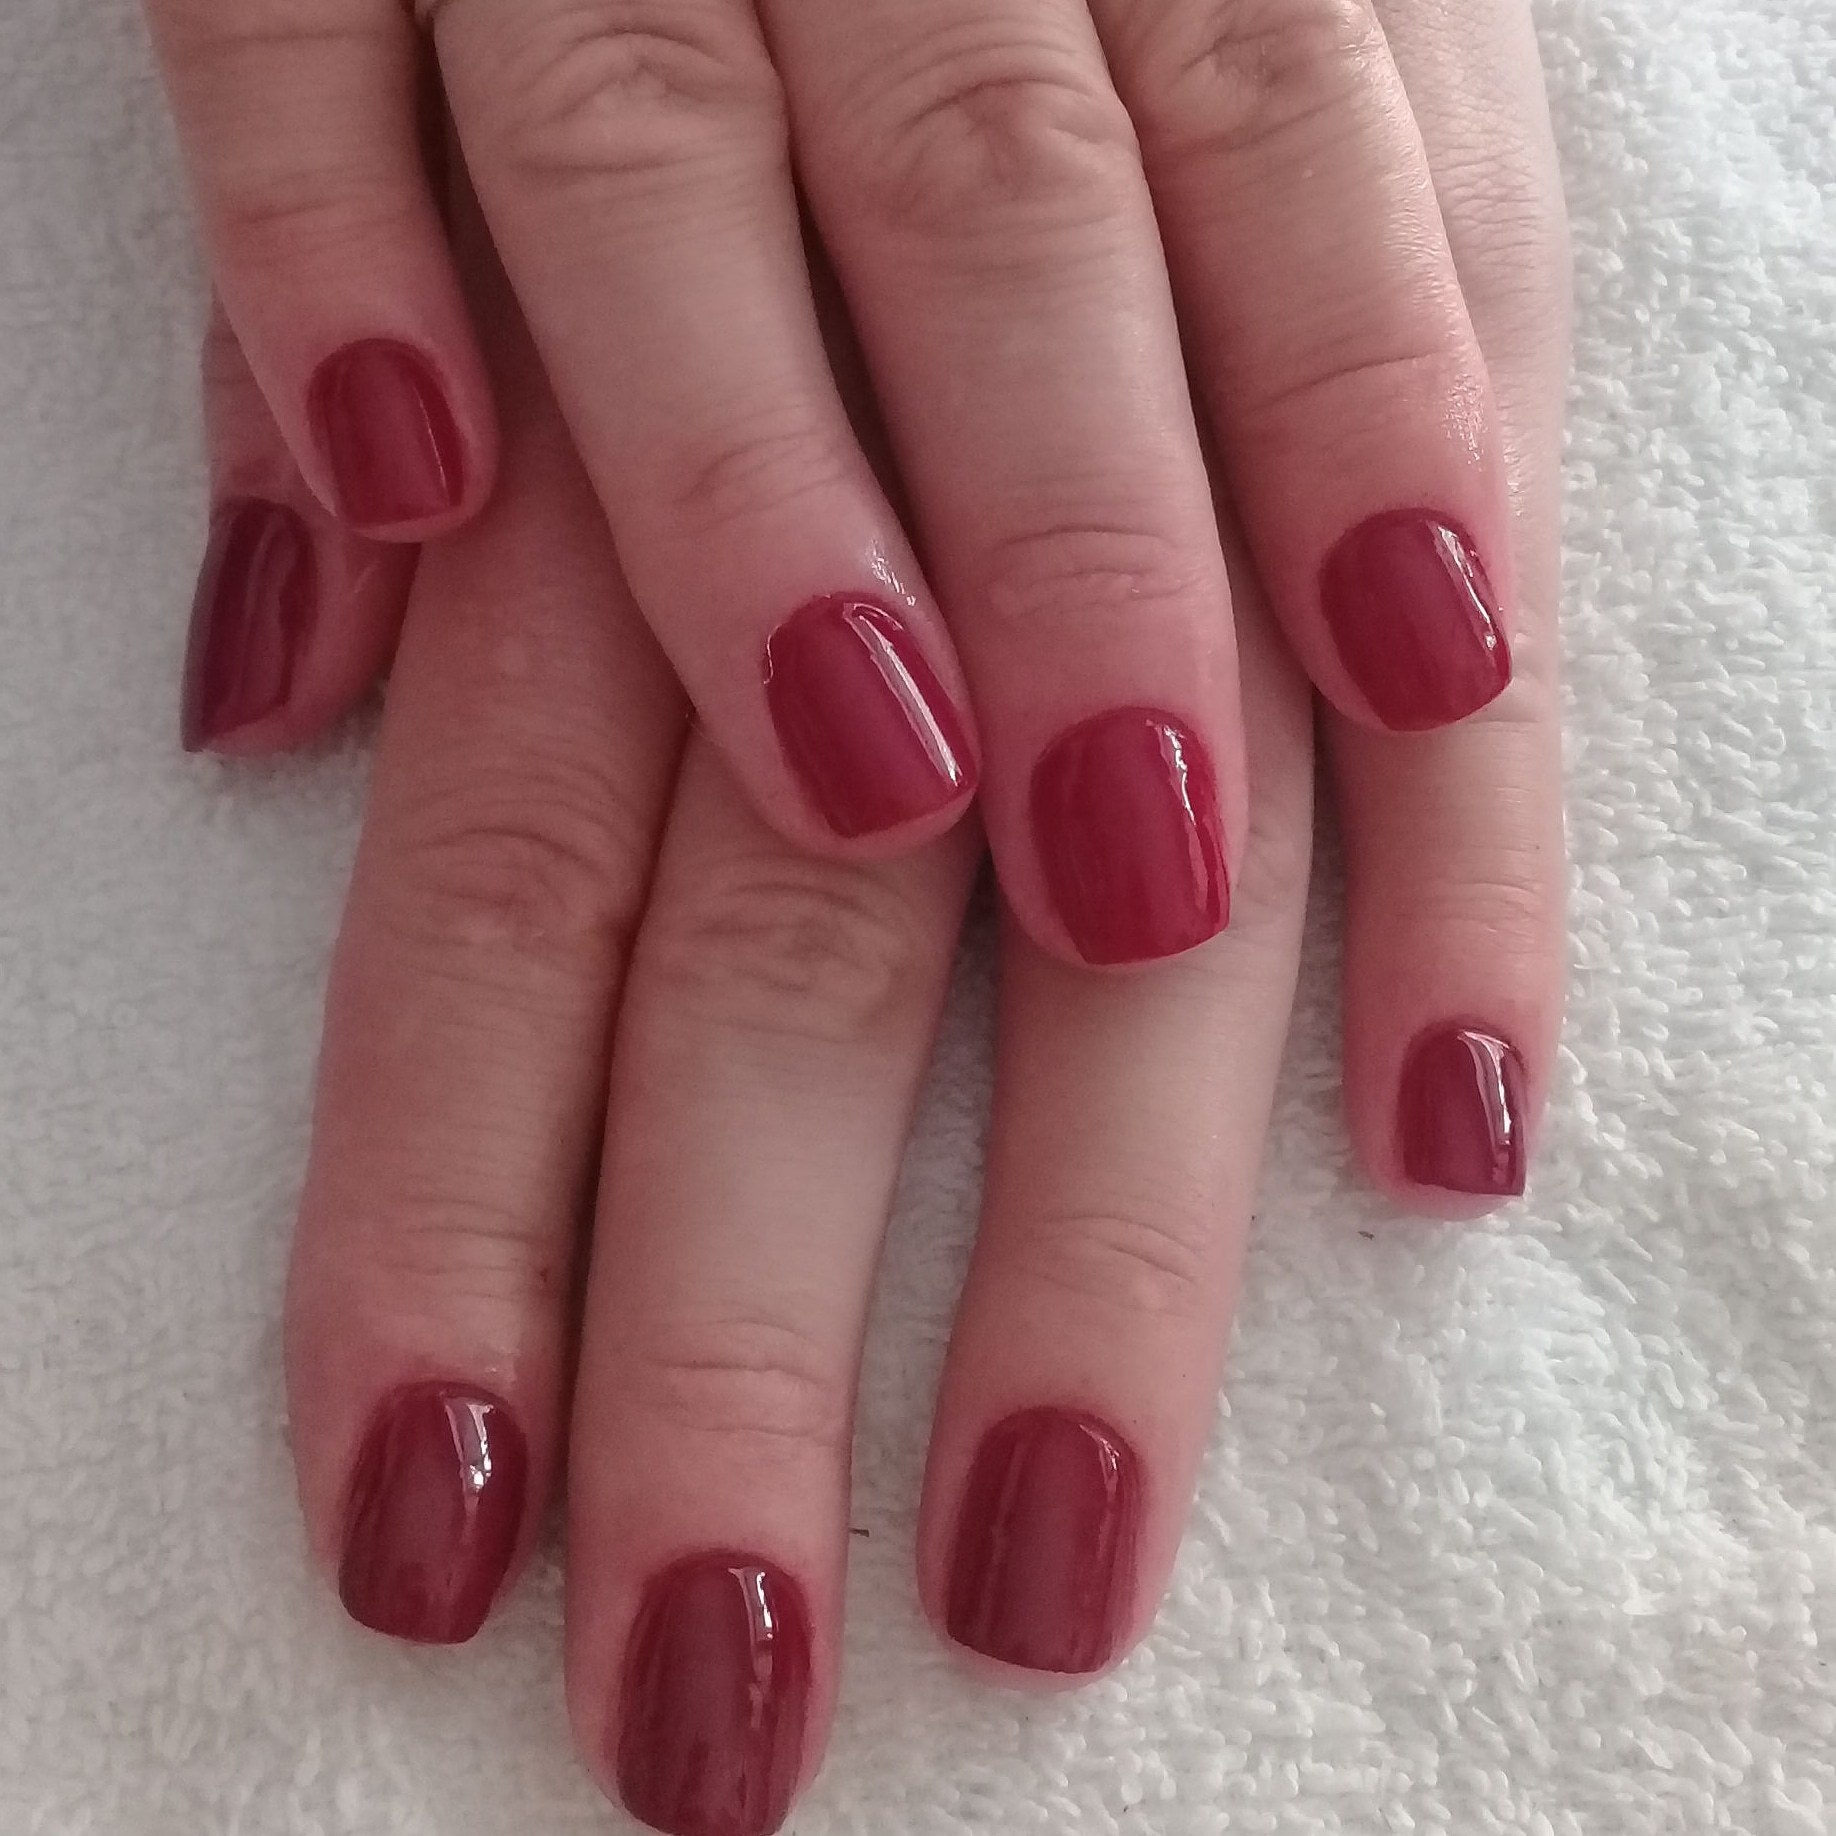 Banho de Gel ! #Vidademanicure unha manicure e pedicure